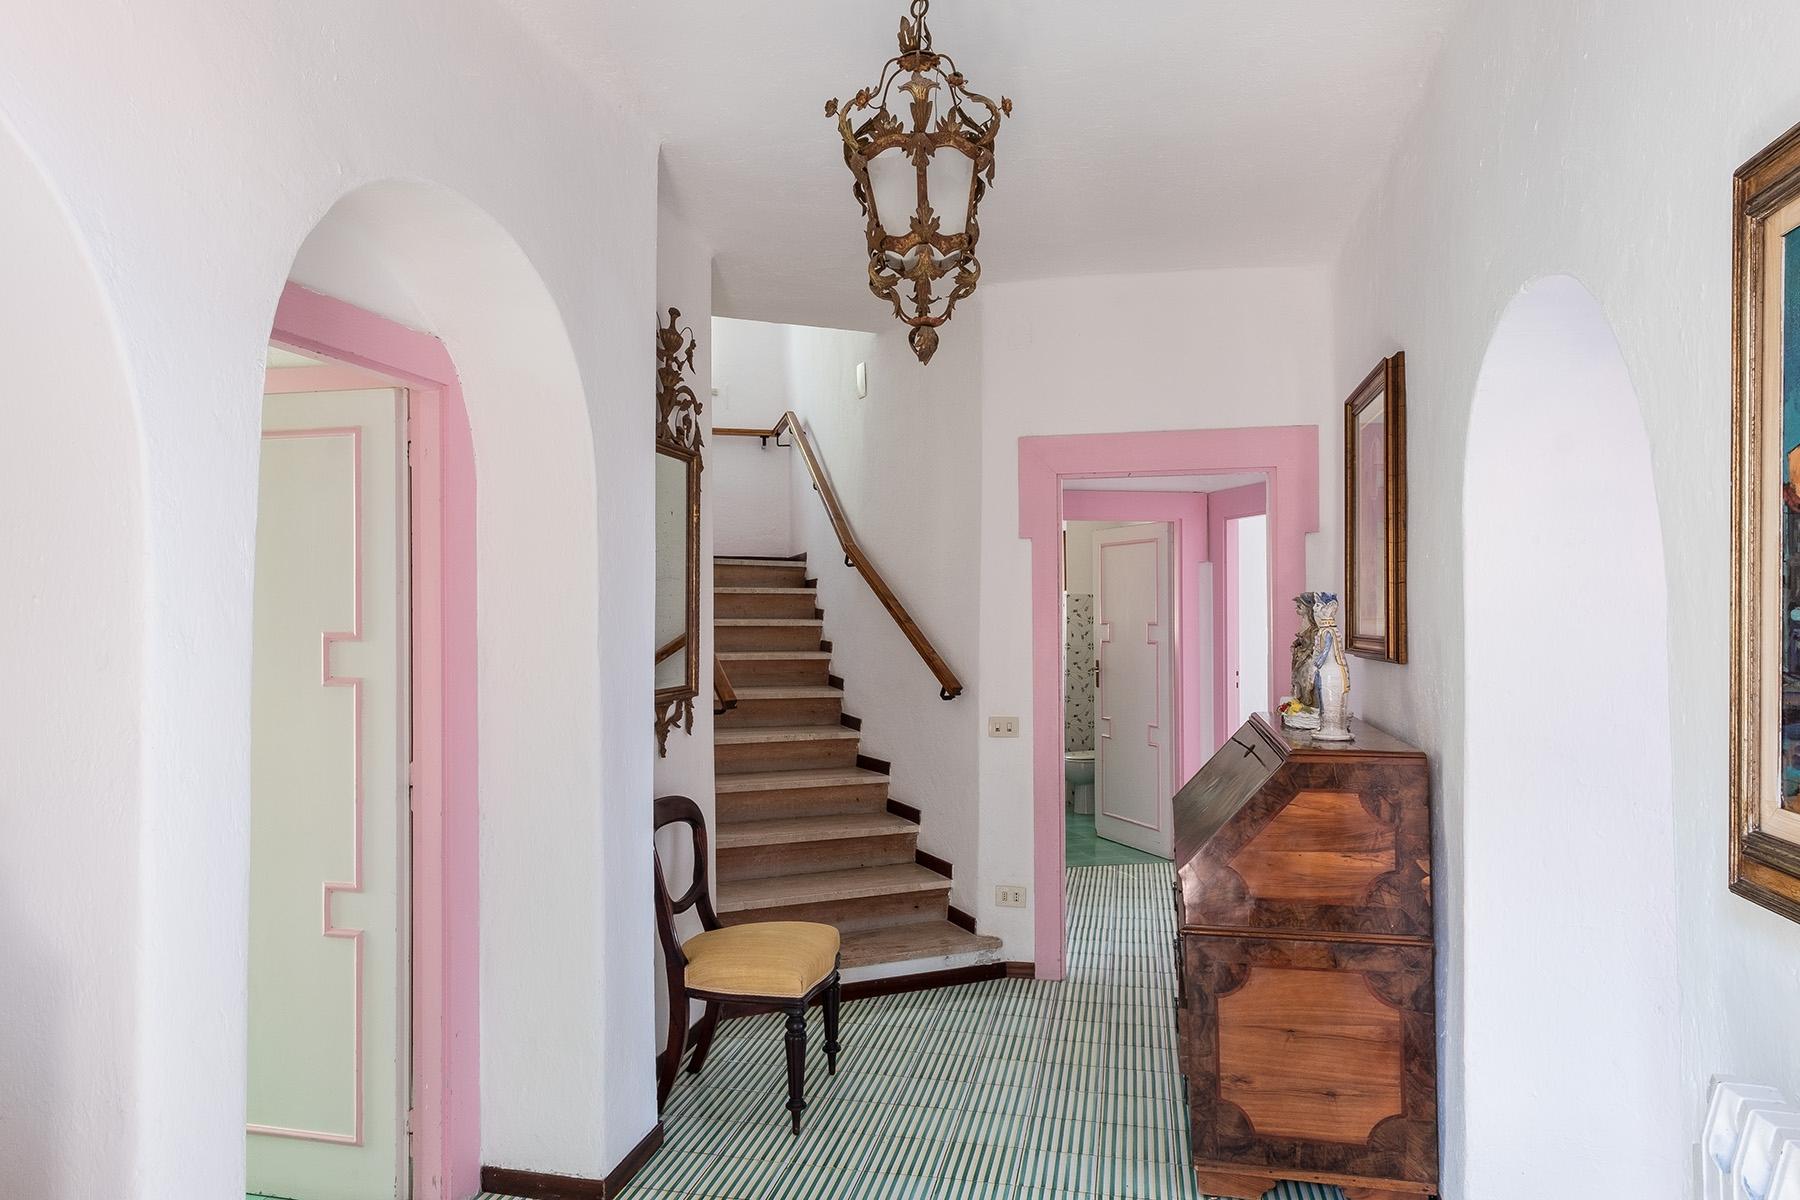 Villa in Vendita a Ischia: 5 locali, 206 mq - Foto 8